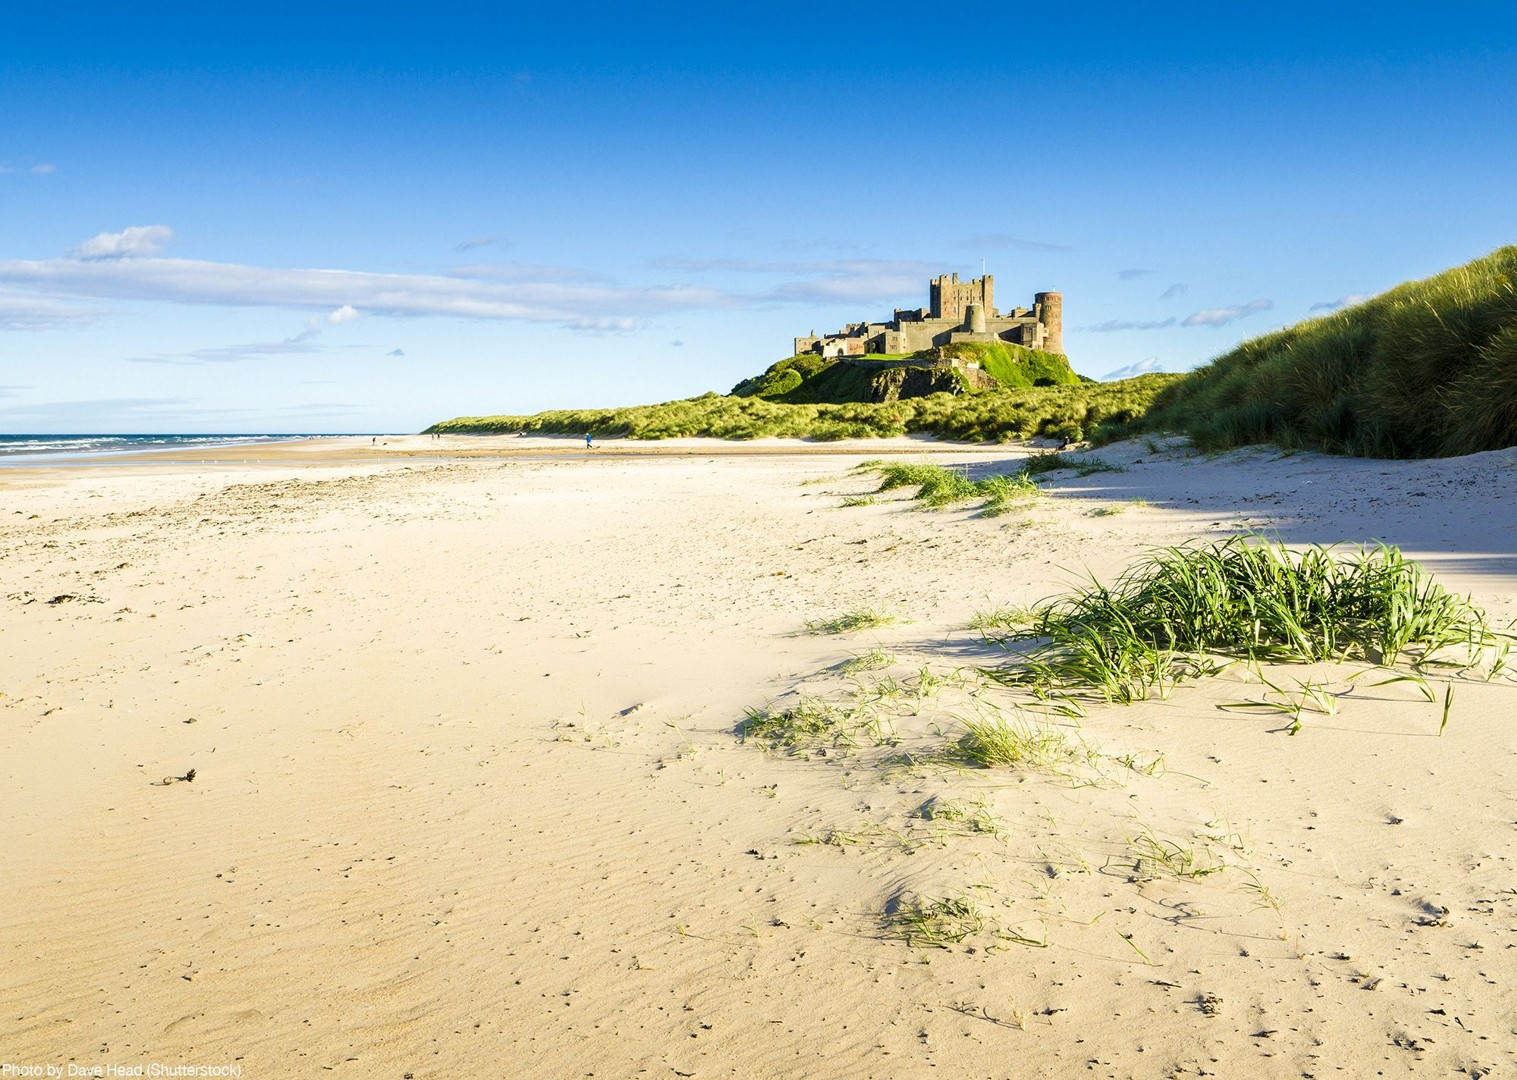 coast-beach-bike-tour-uk-self-guided-saddle-skedaddle-warkworth-castle.jpg - UK - Northumberland - Alnmouth - Self-Guided Leisure Cycling Holiday - Leisure Cycling